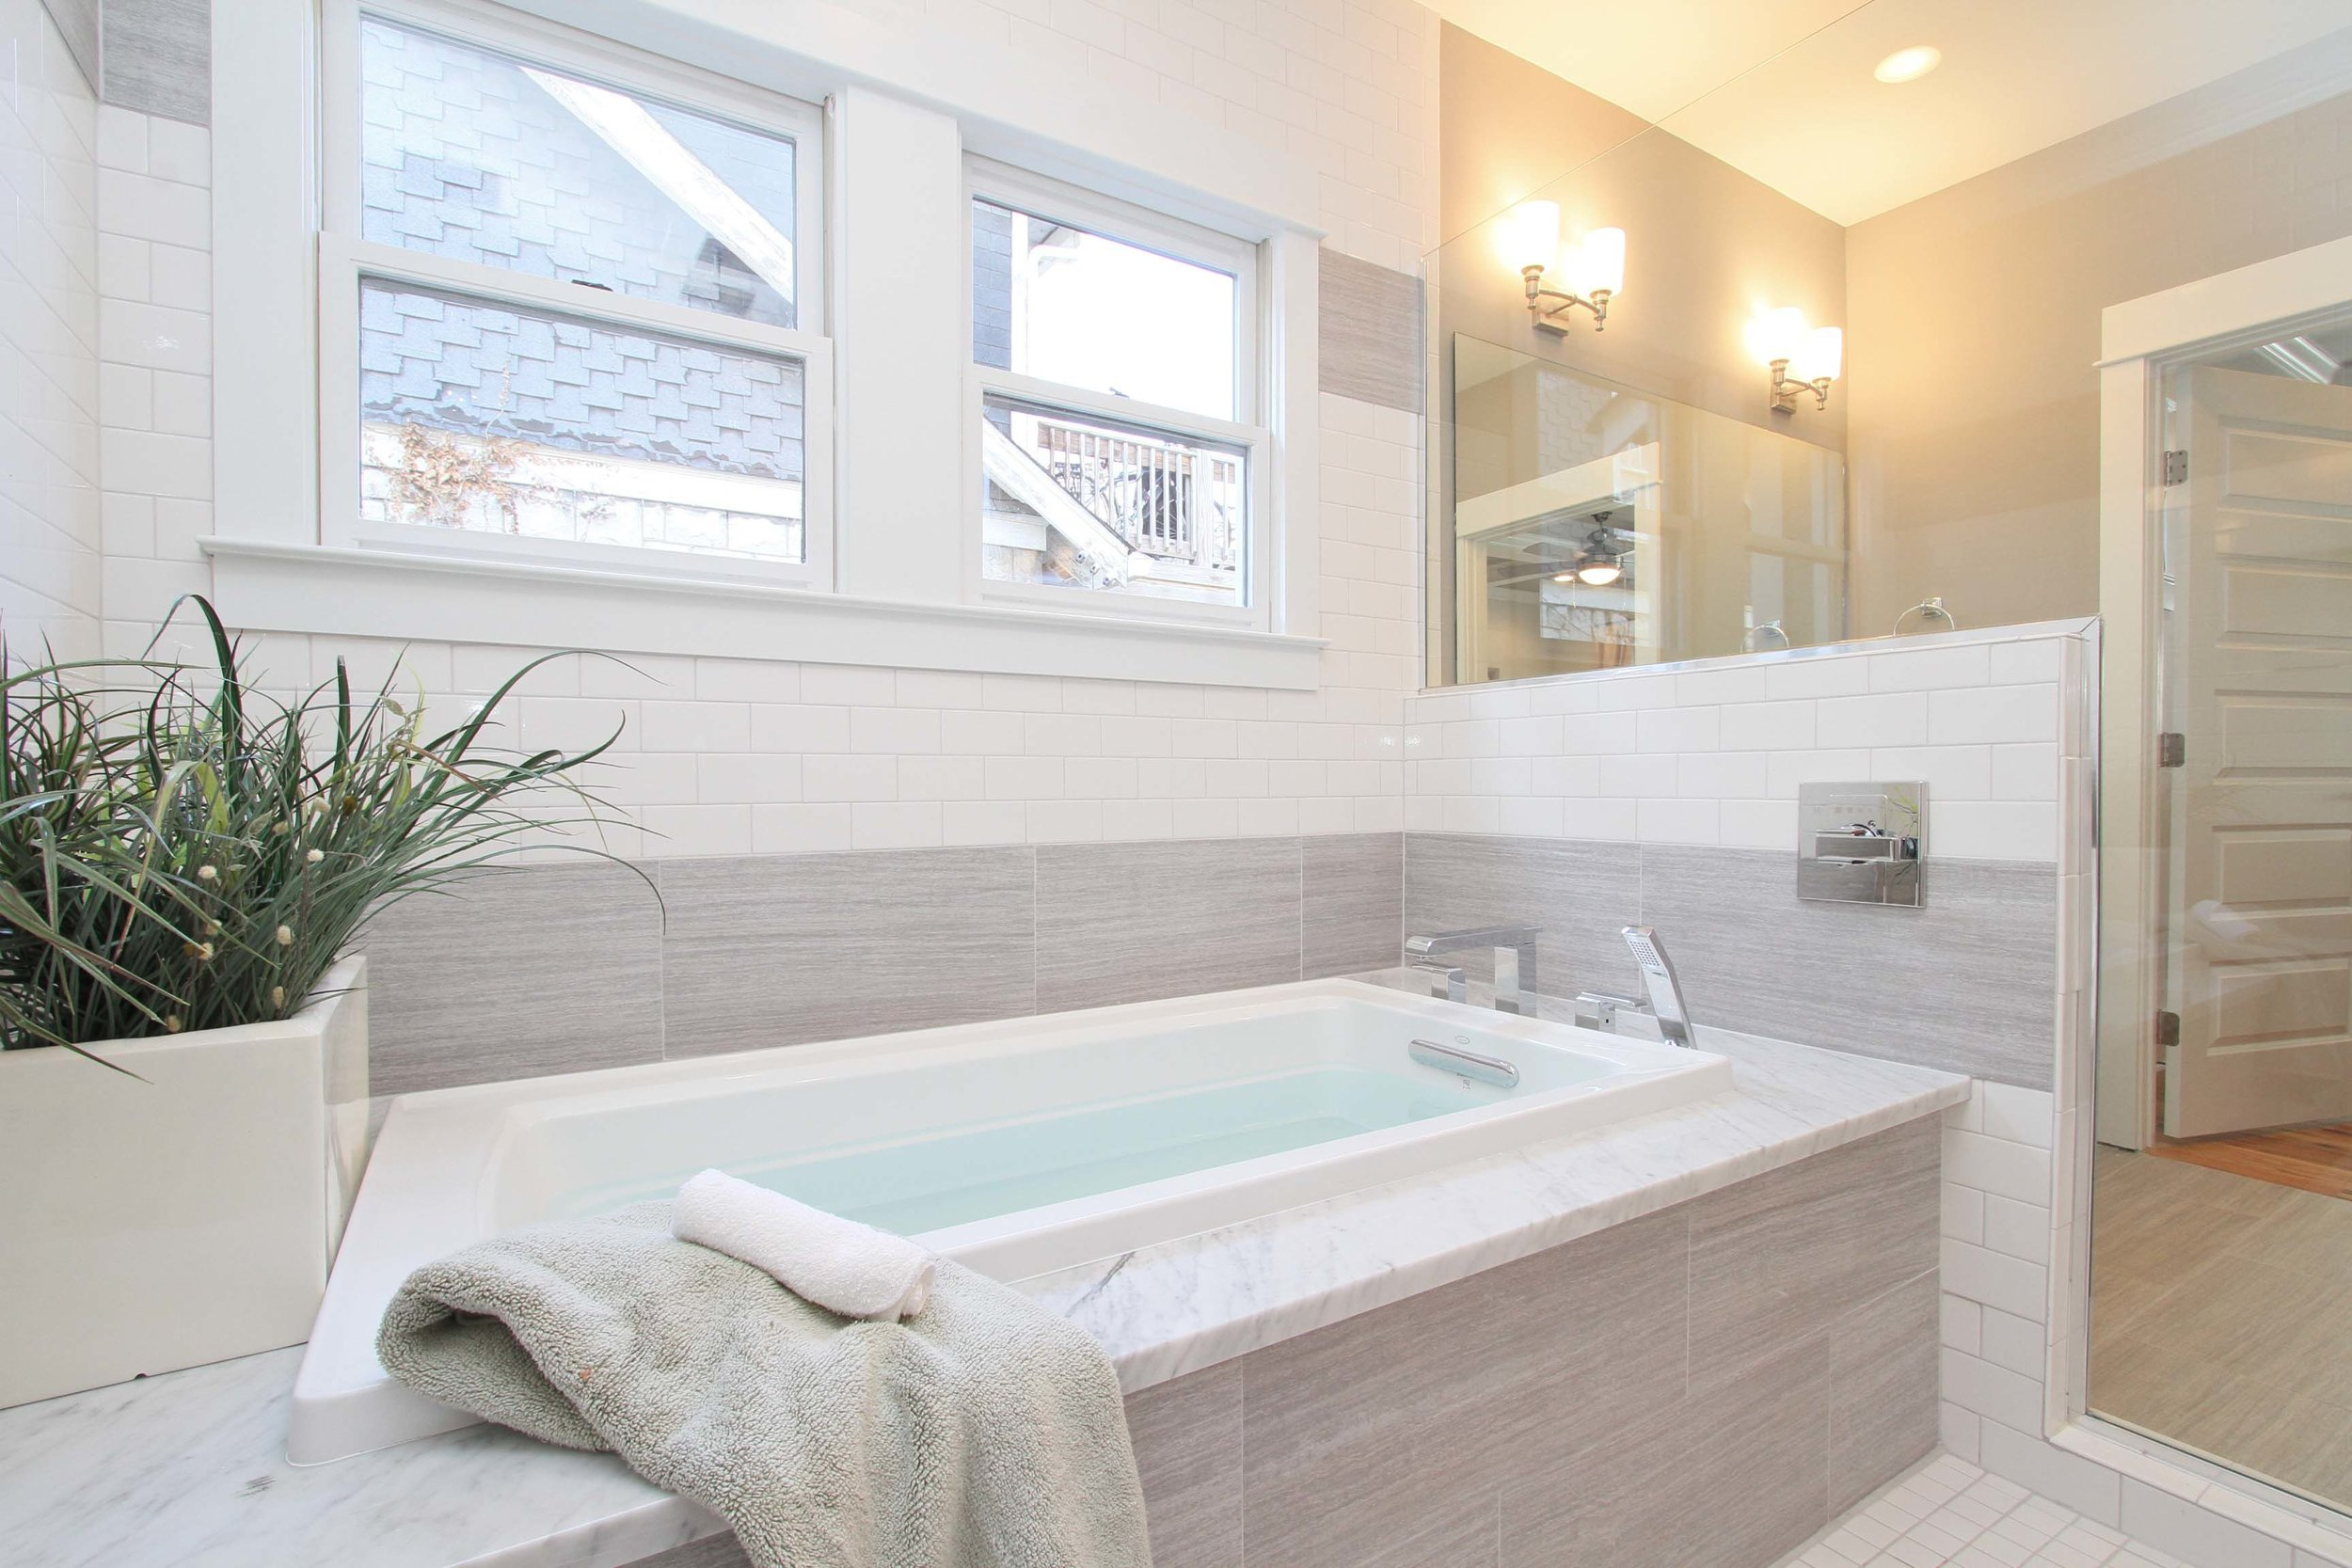 House-Plans-Online-Historic-Nashville-Peggy-Newman-Renovation-Bath-Wet Room-Murphy.jpg